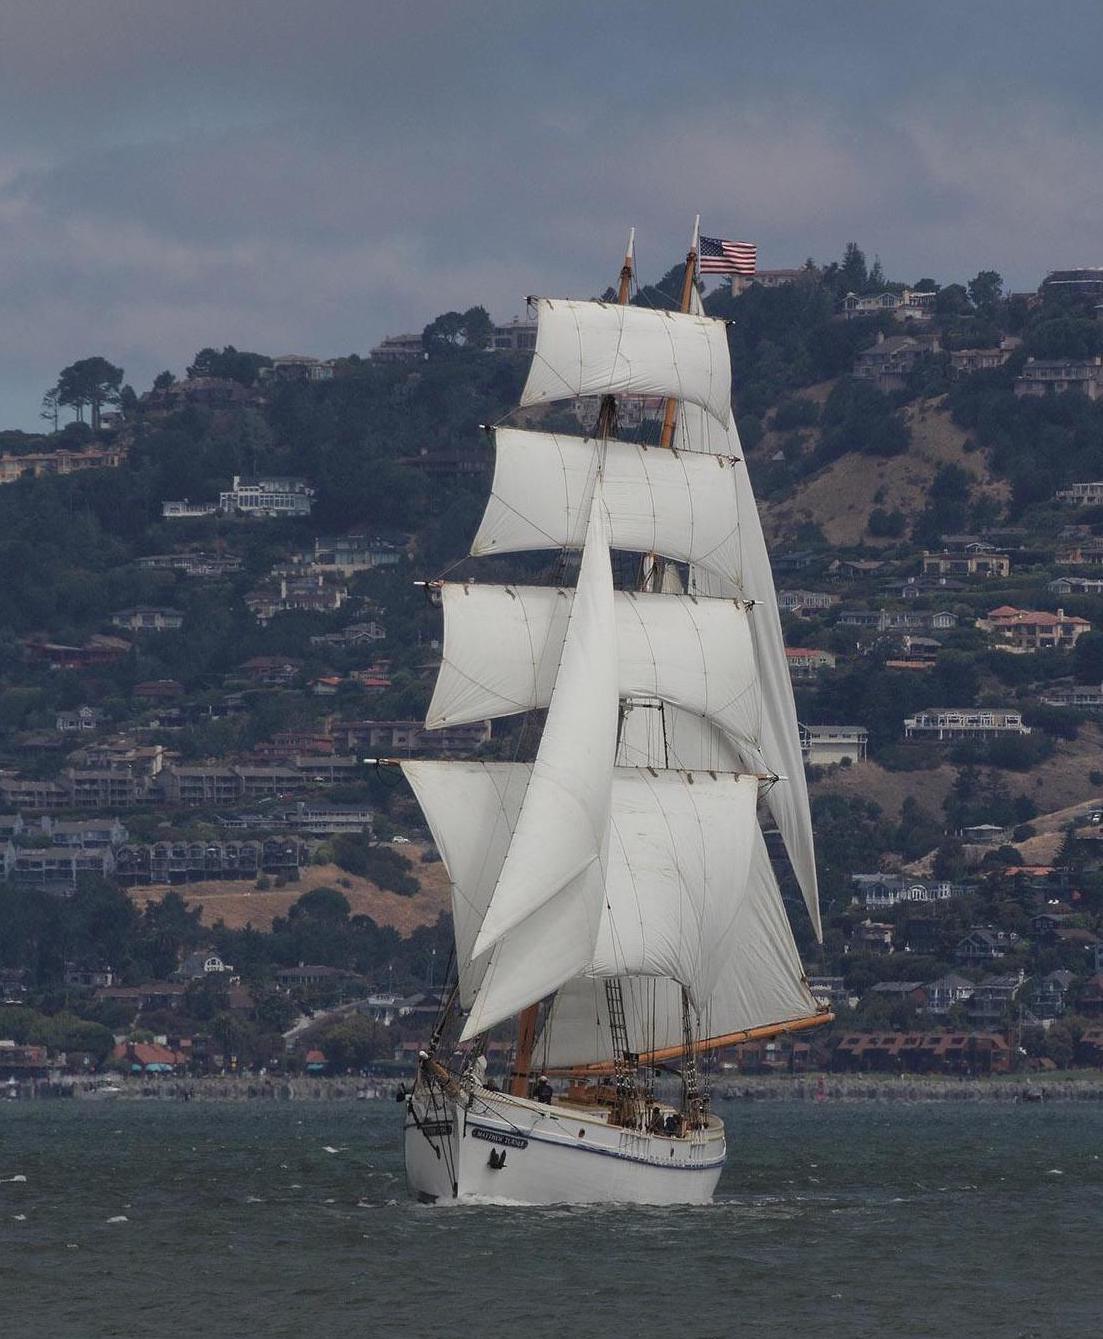 Matthew Turner flies her sails on the Bay